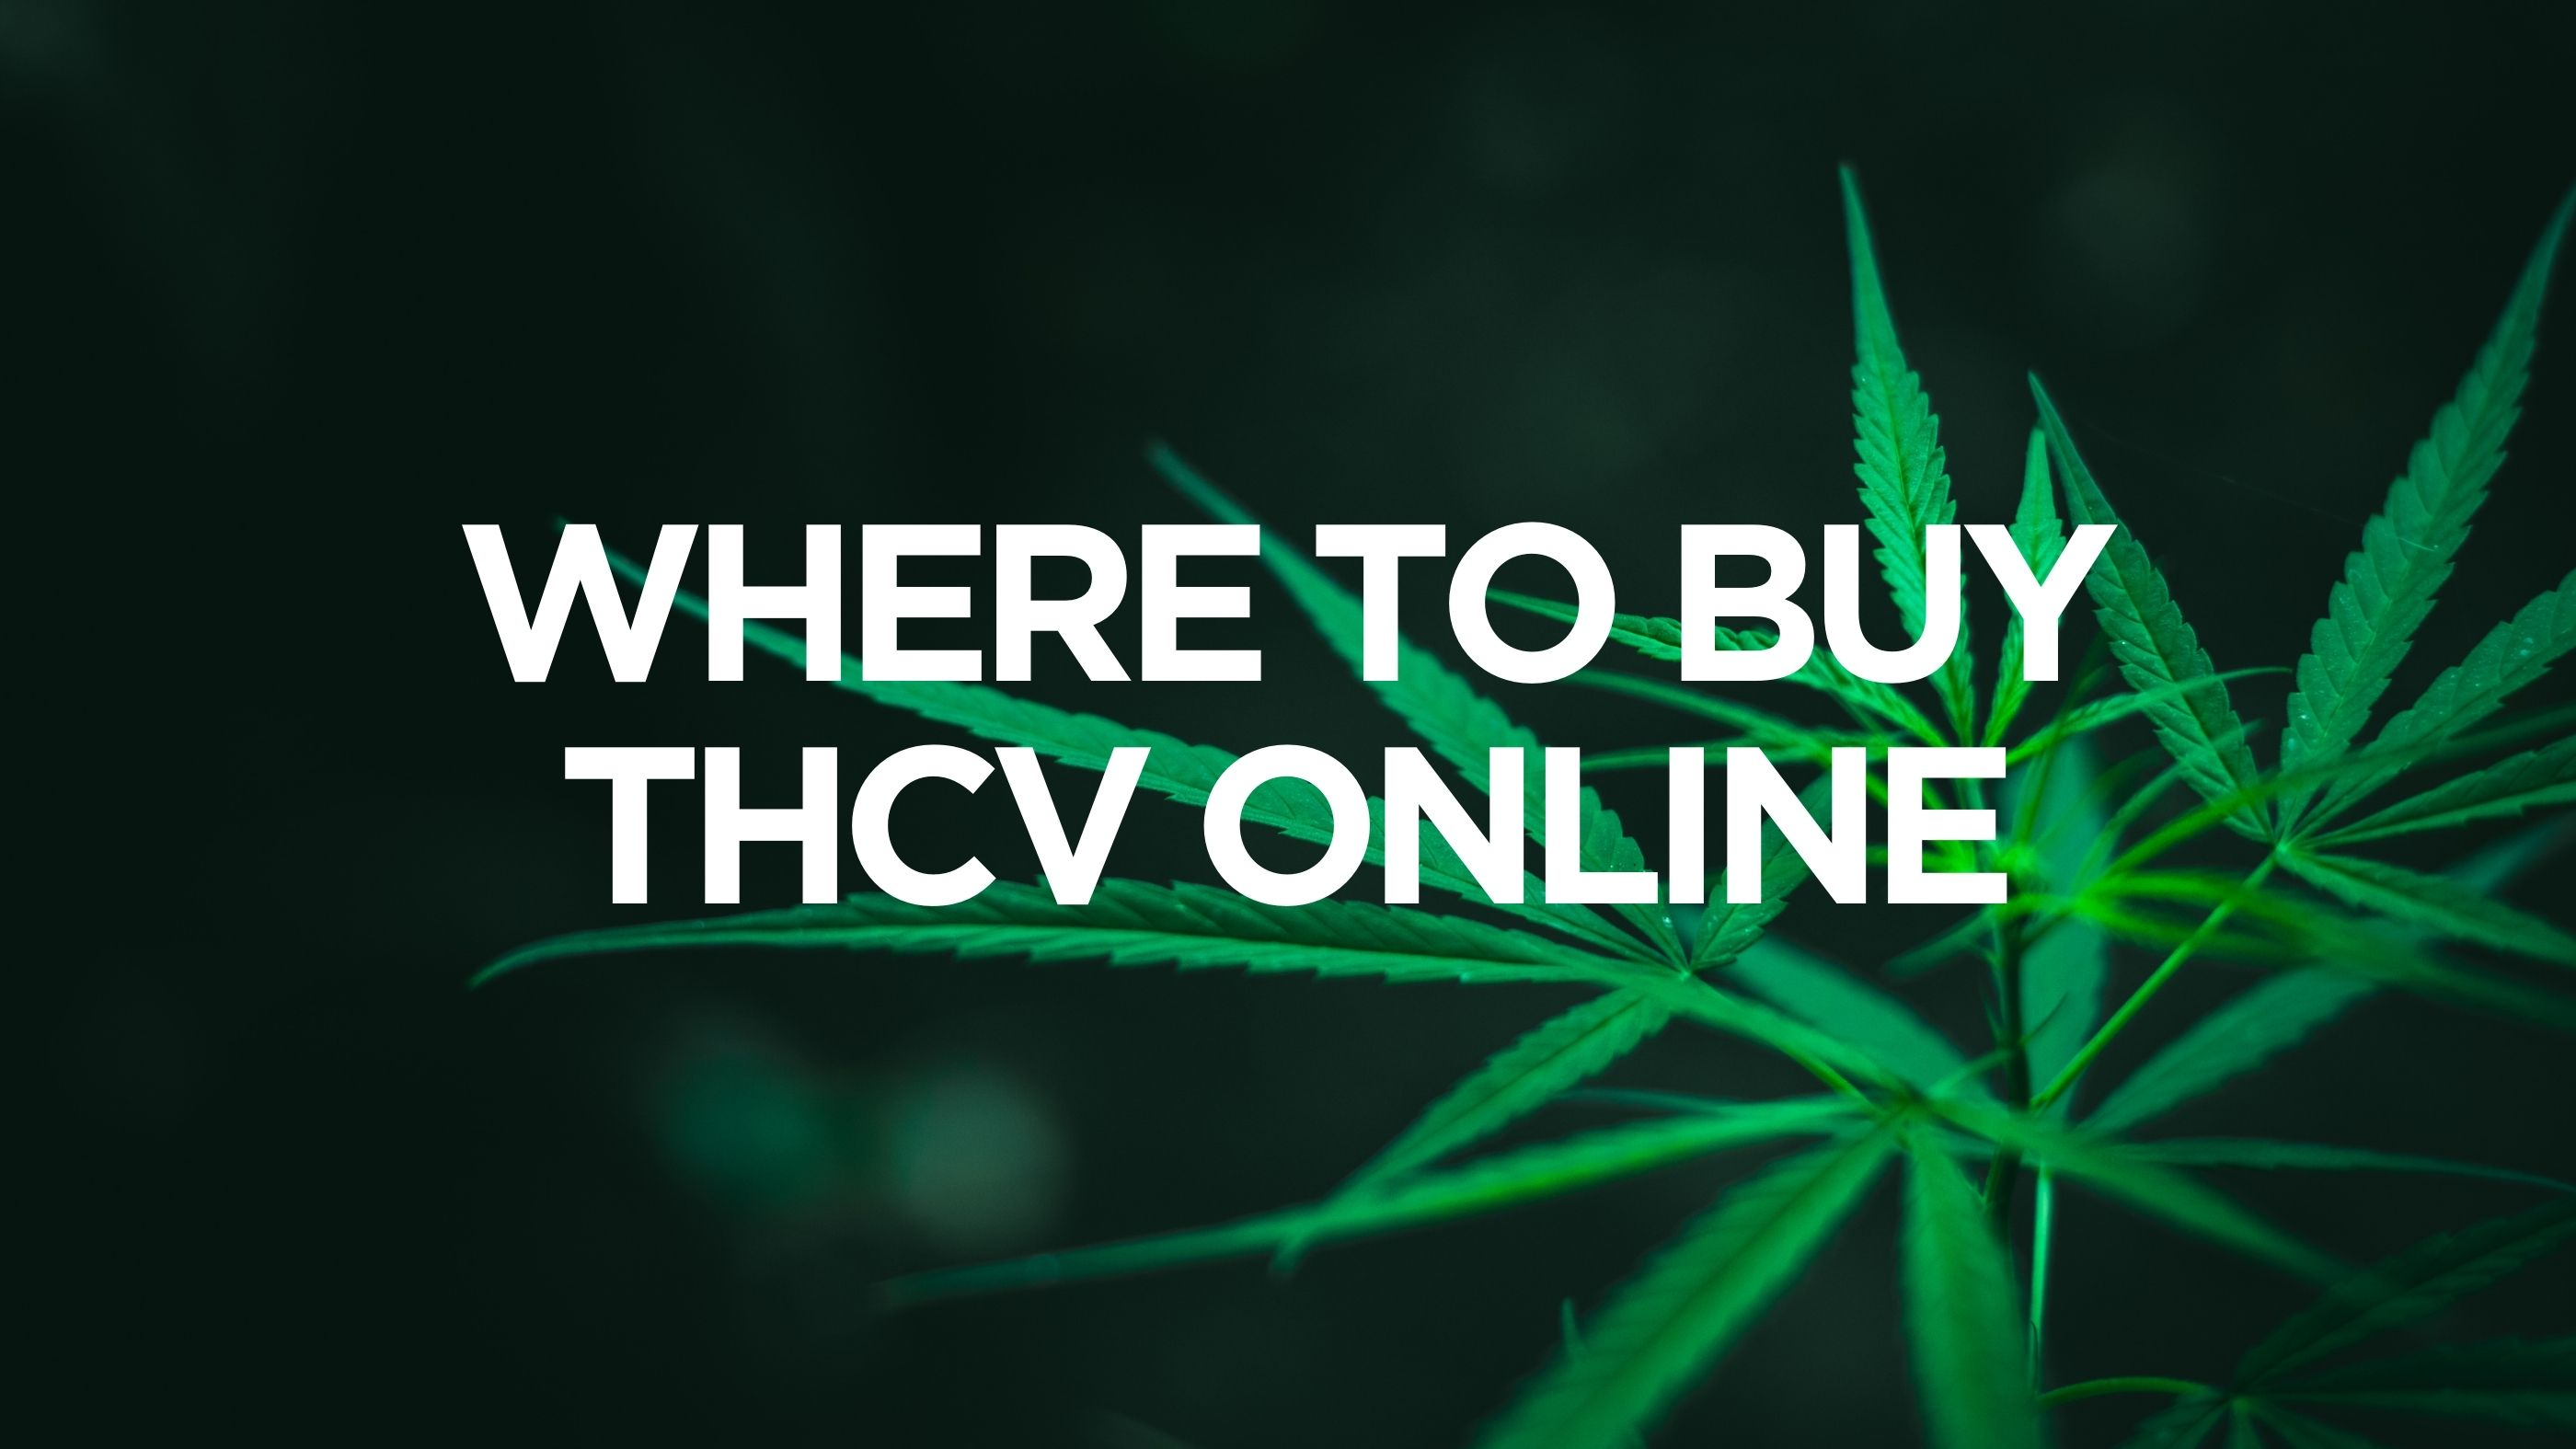 Where to Buy THCV Online